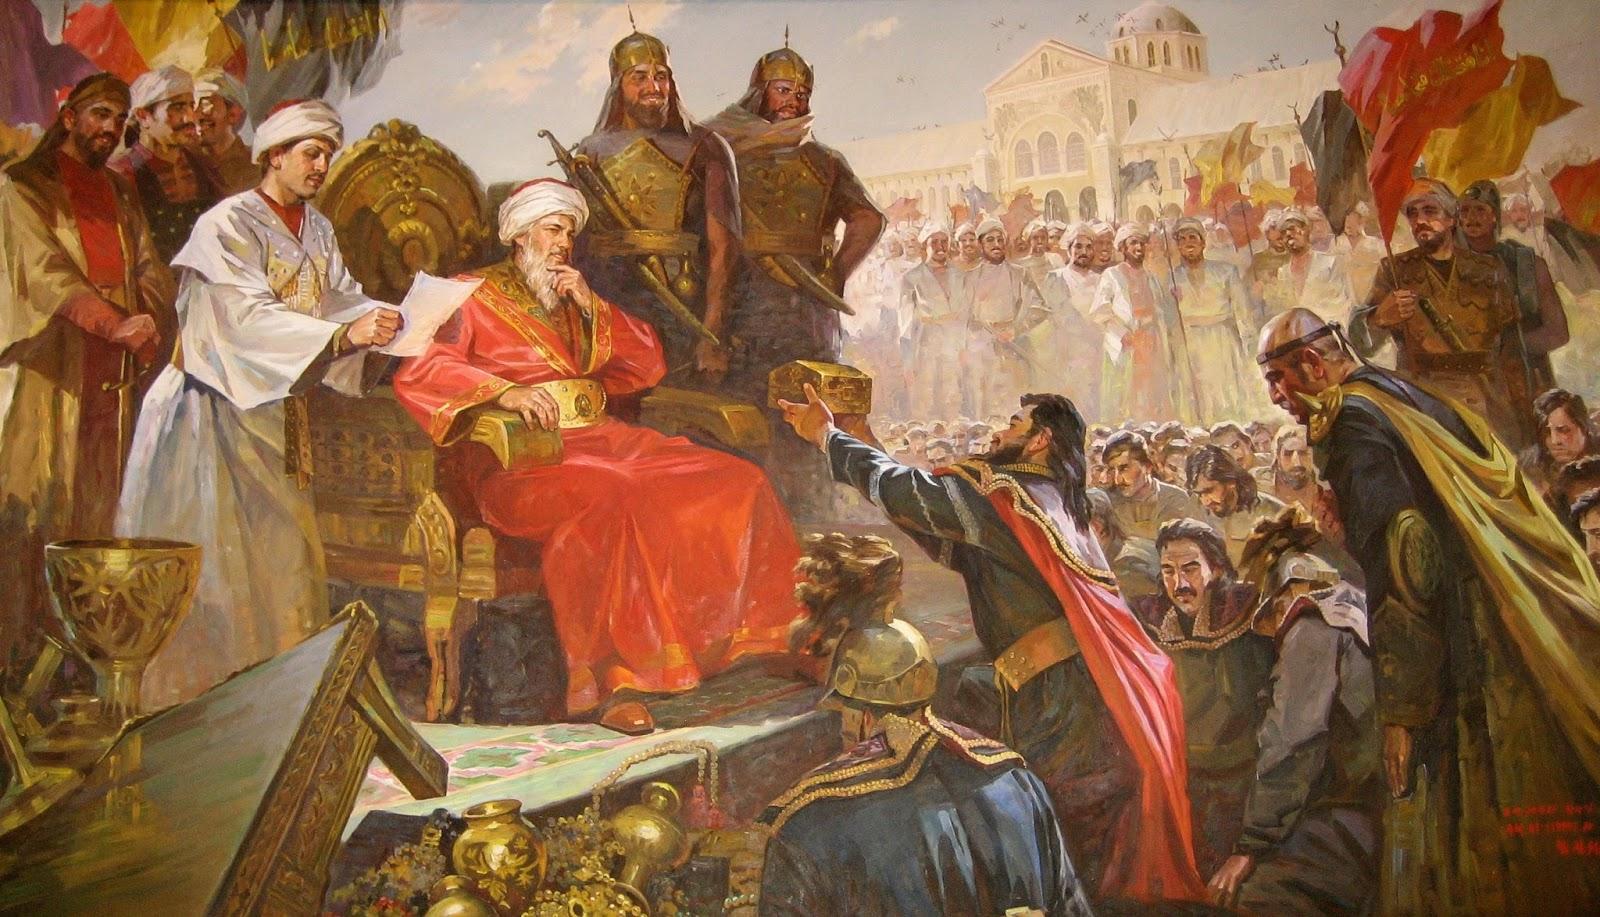 Sejarah Singkat Khilafah Islam: Melihat Sisi Terang dan Sisi Gelapnya